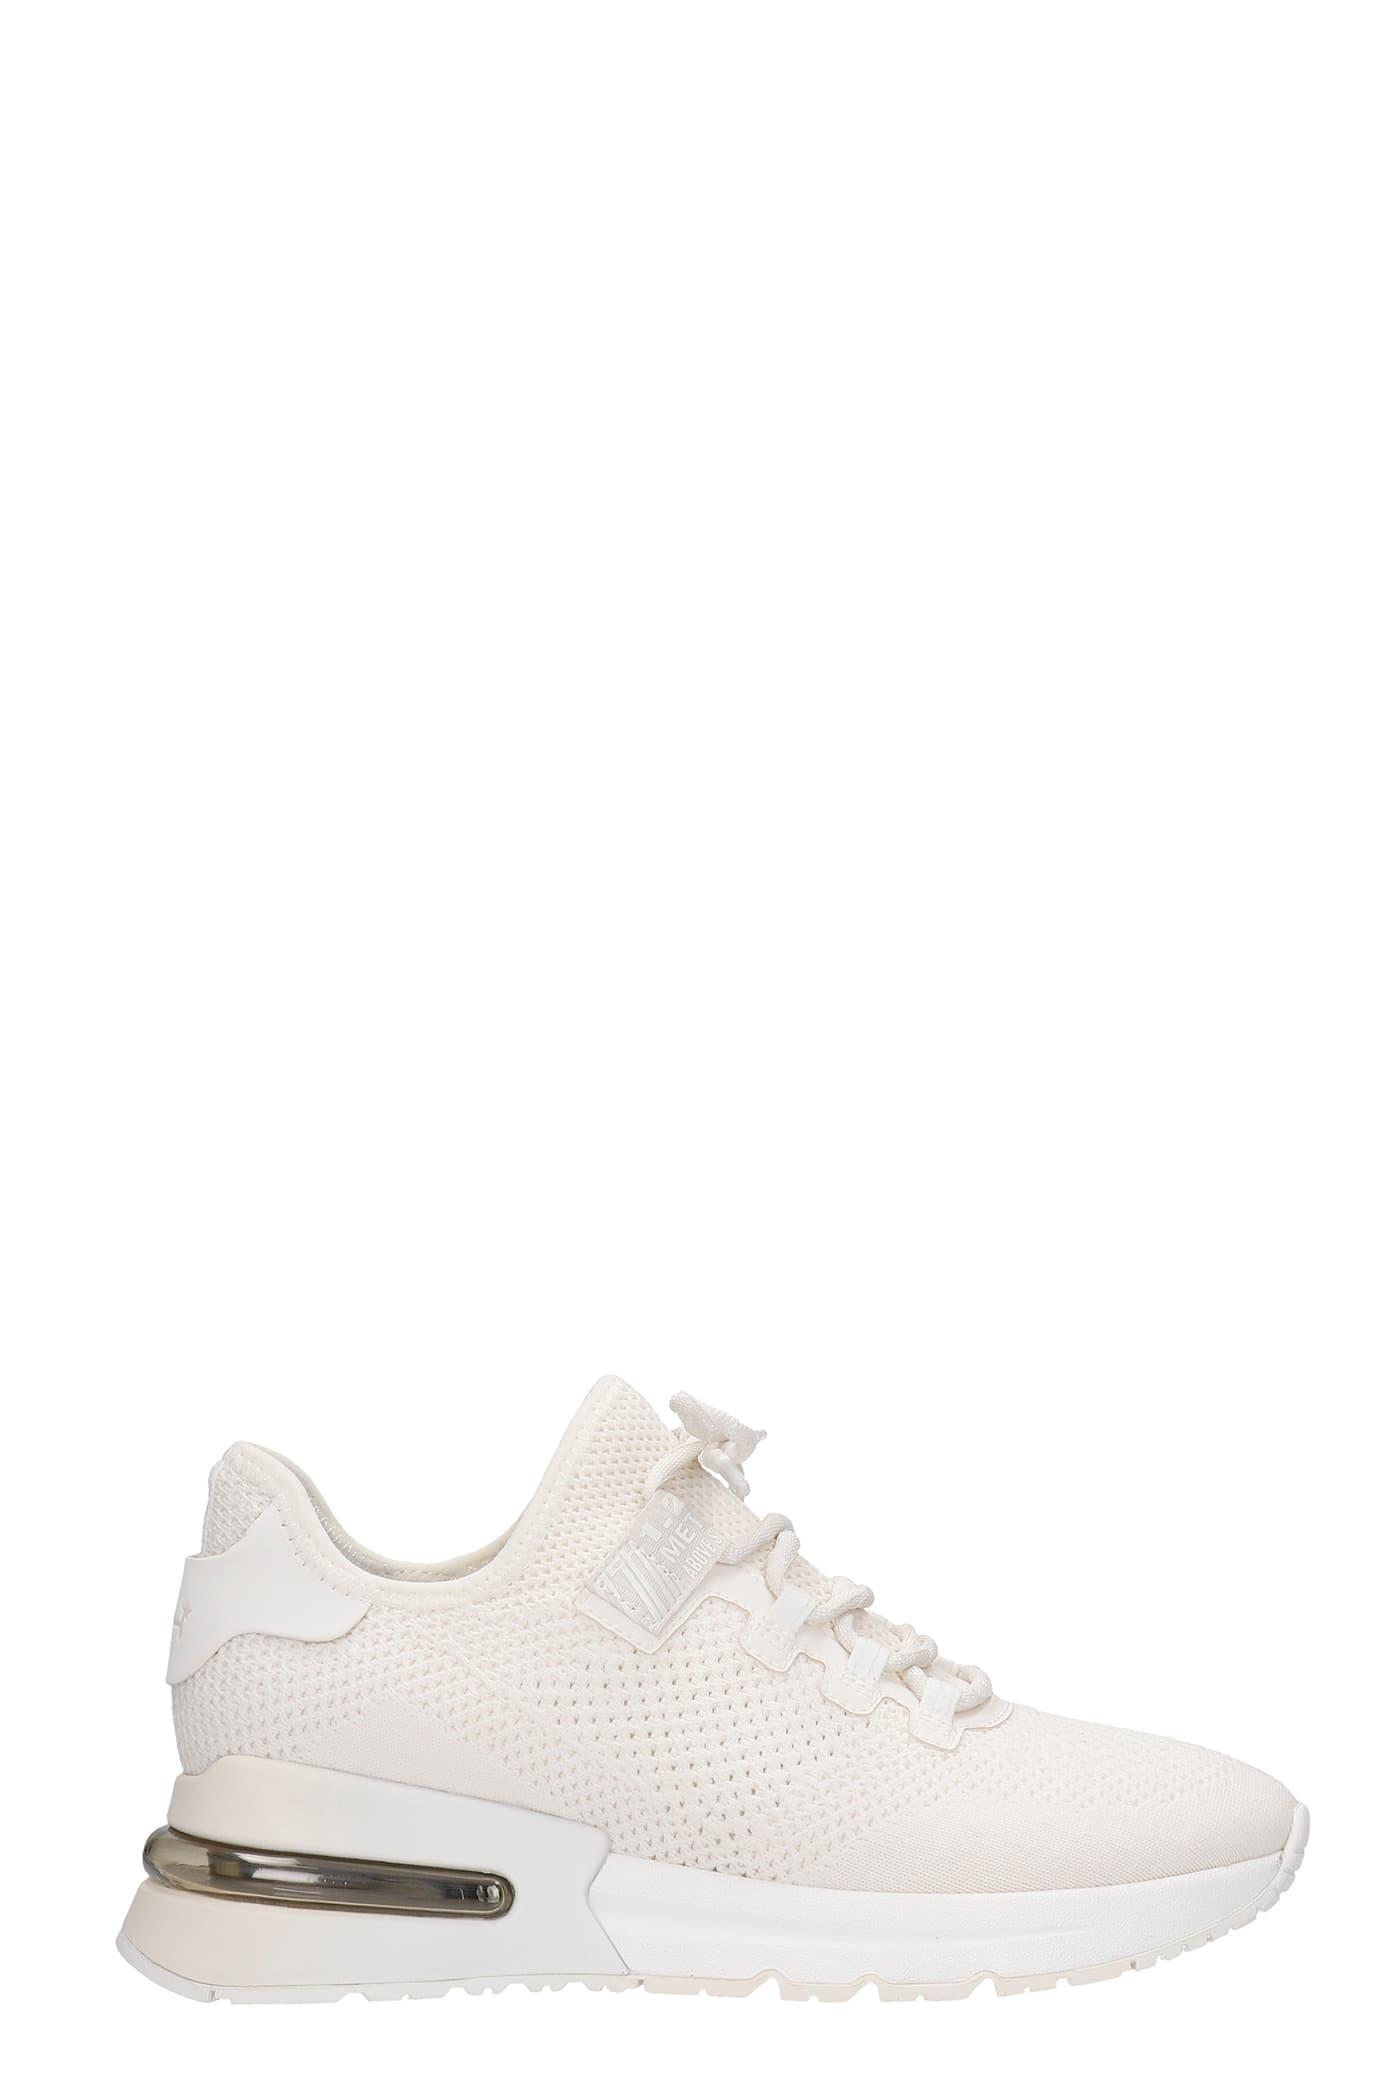 Ash Sneakers KRUSH DEGRADE SNEAKERS IN WHITE SYNTHETIC FIBERS